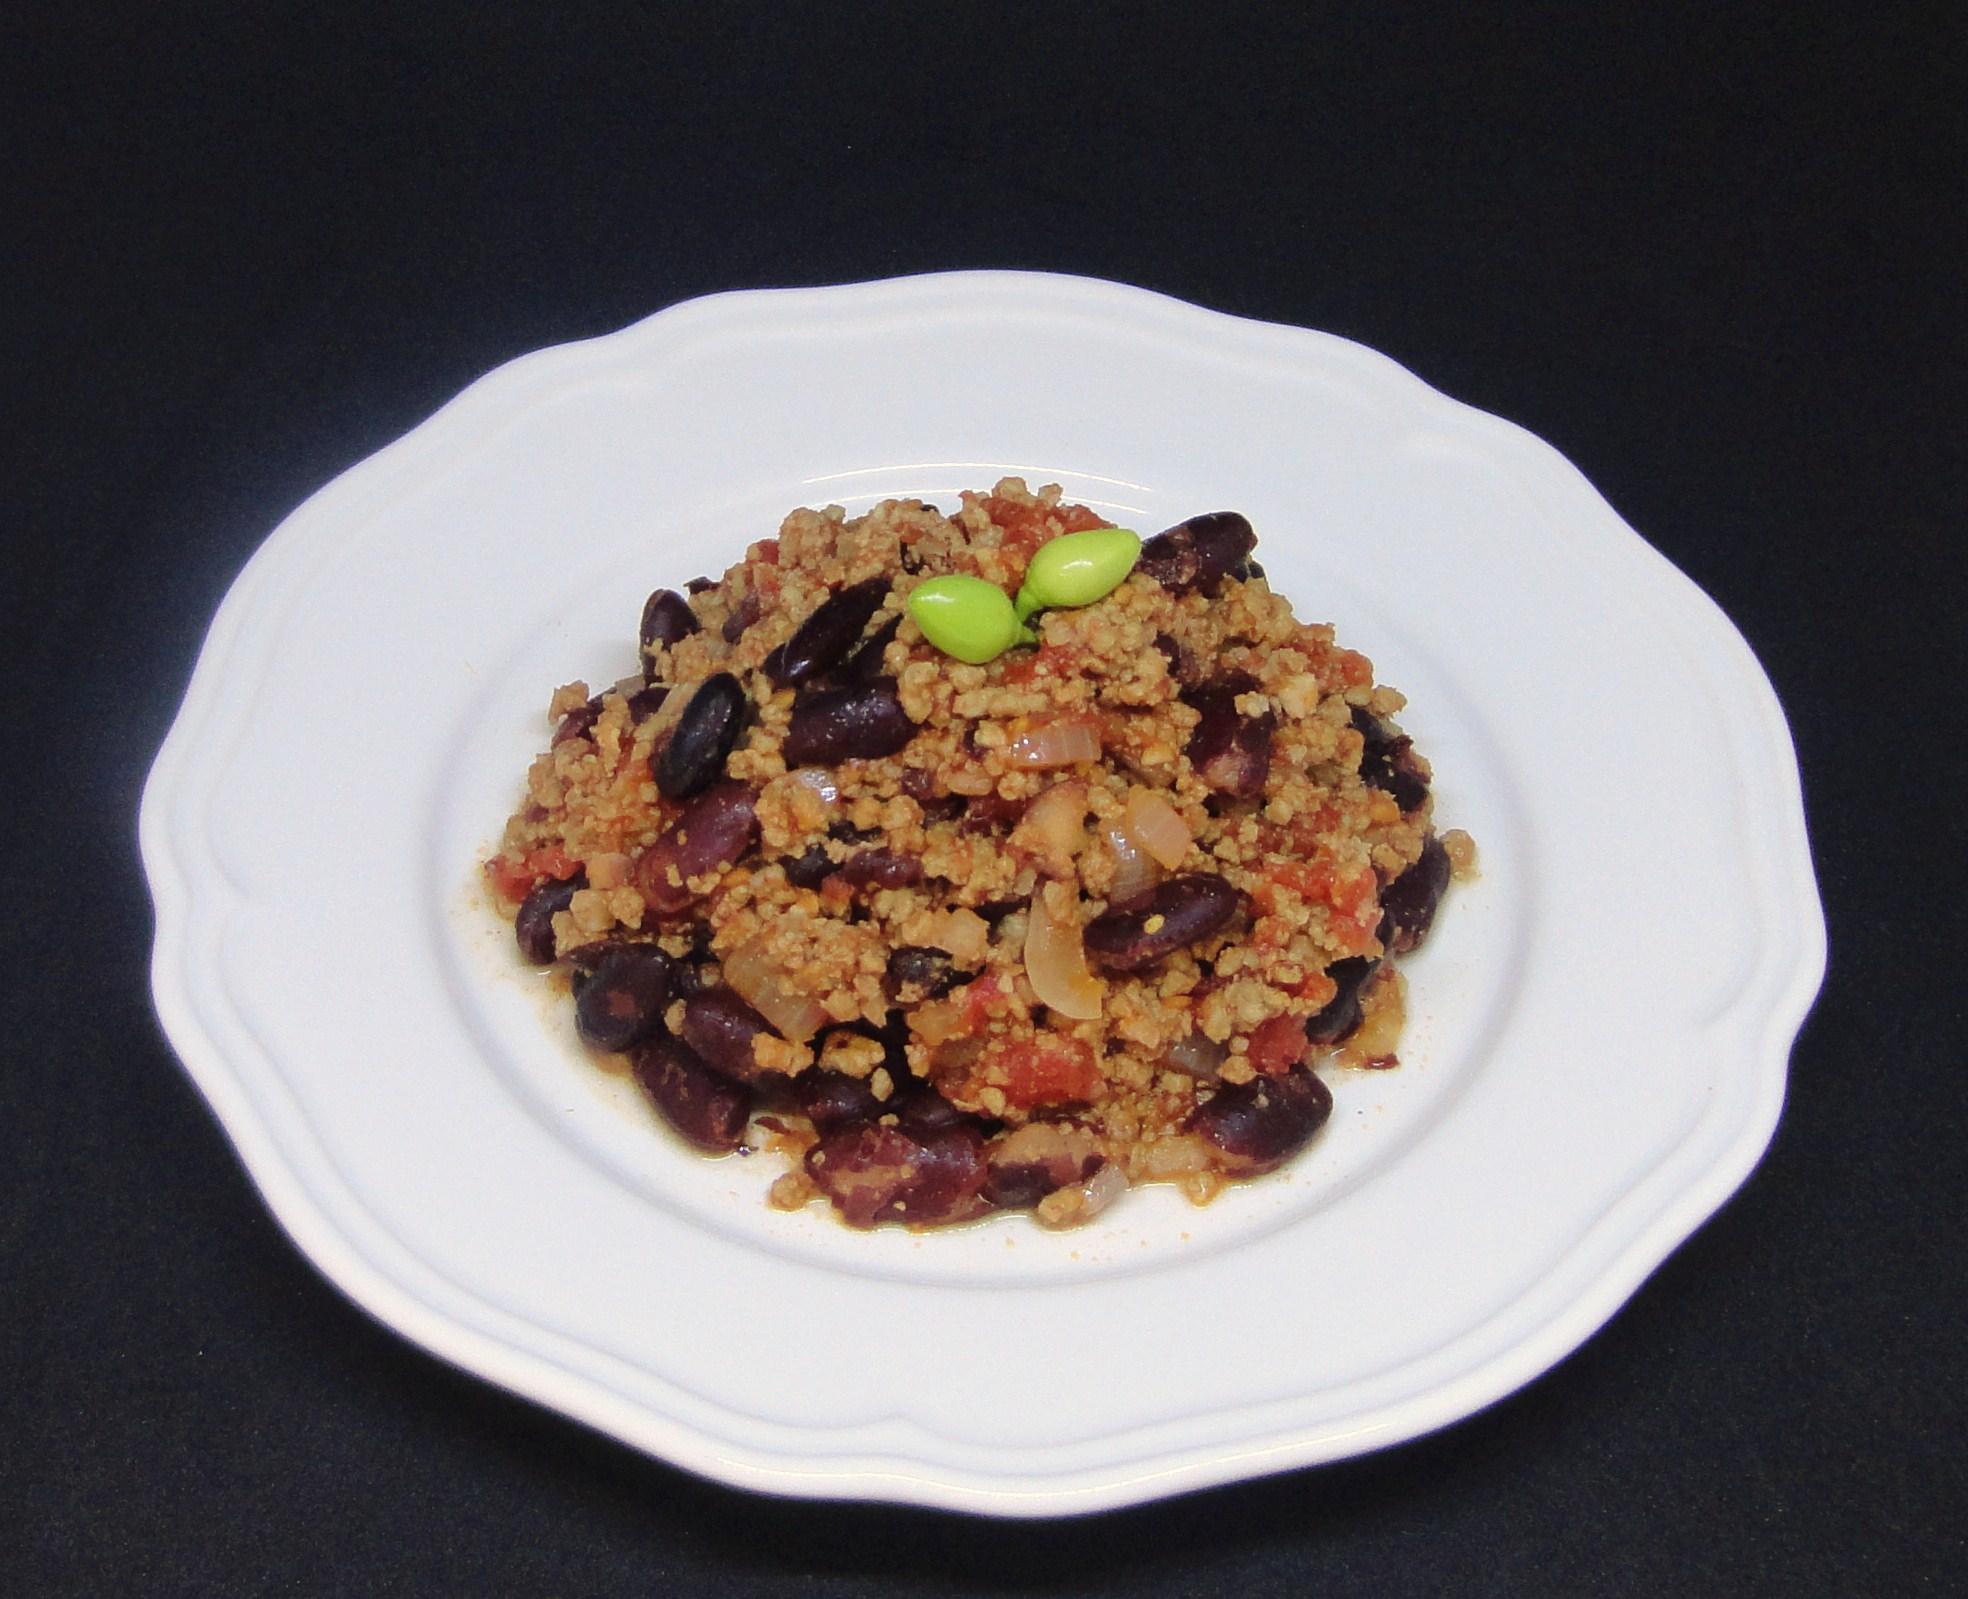 Chili com Carne de Vaca